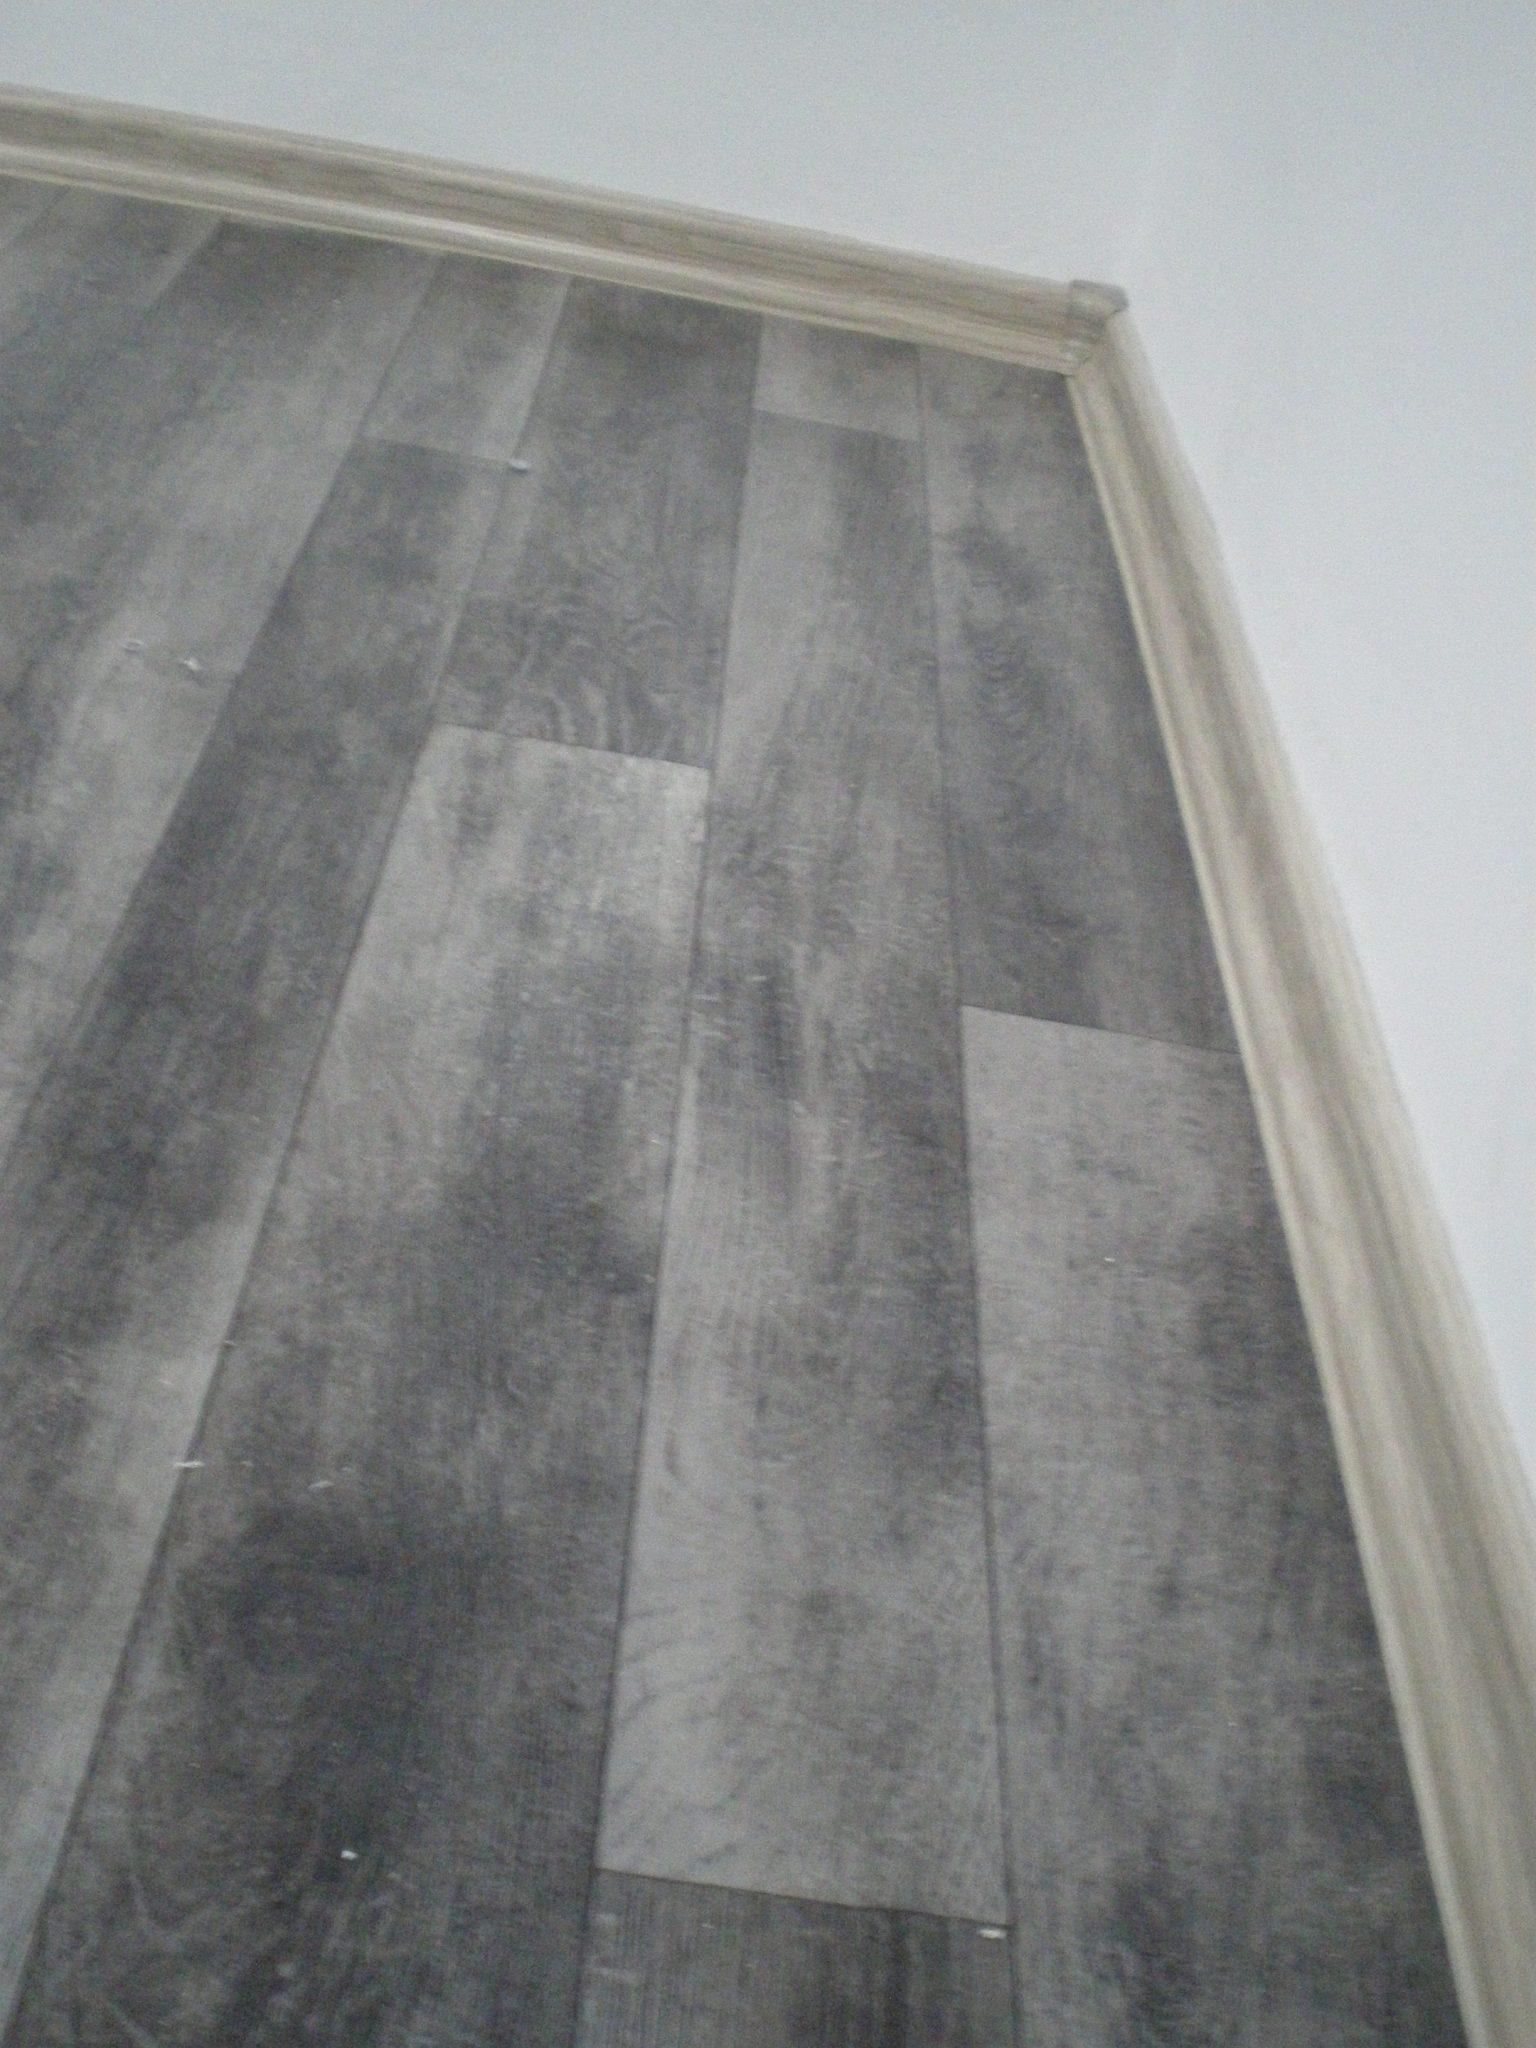 covor linoleum pvc preturi concurentiale dhn. Black Bedroom Furniture Sets. Home Design Ideas